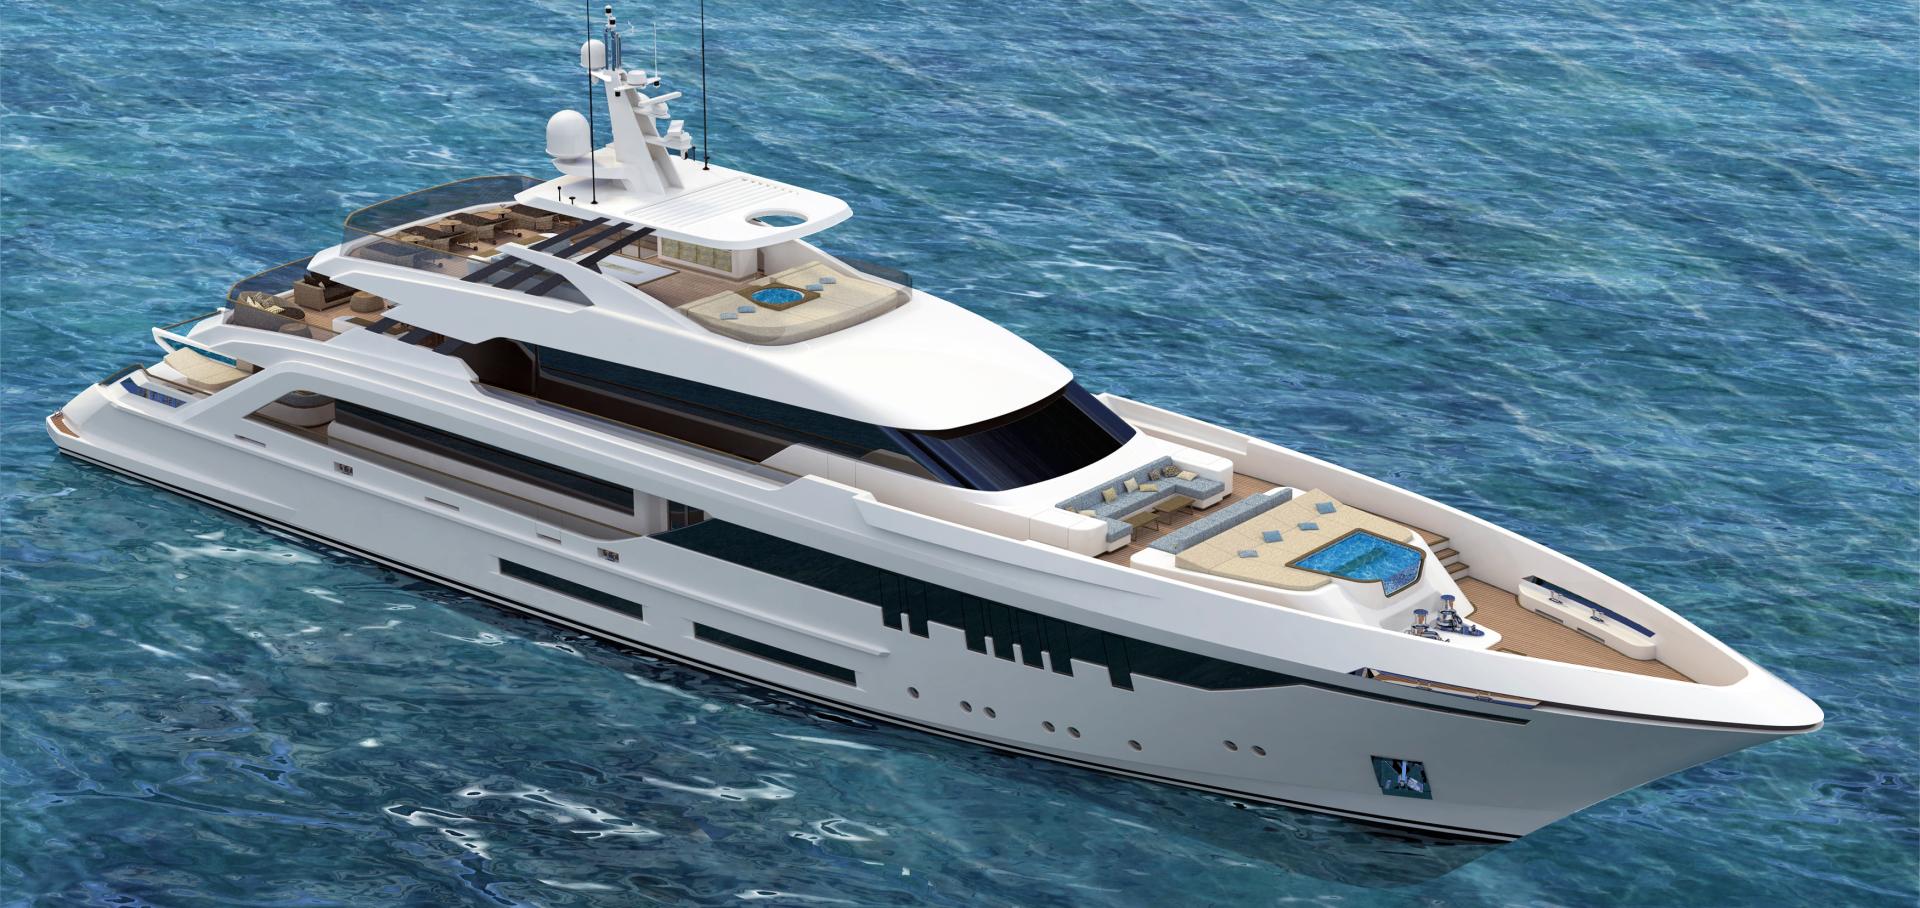 GHI Yachts 2023-THUNDERBIRD 165 Korea, Republic of-1337228 | Thumbnail